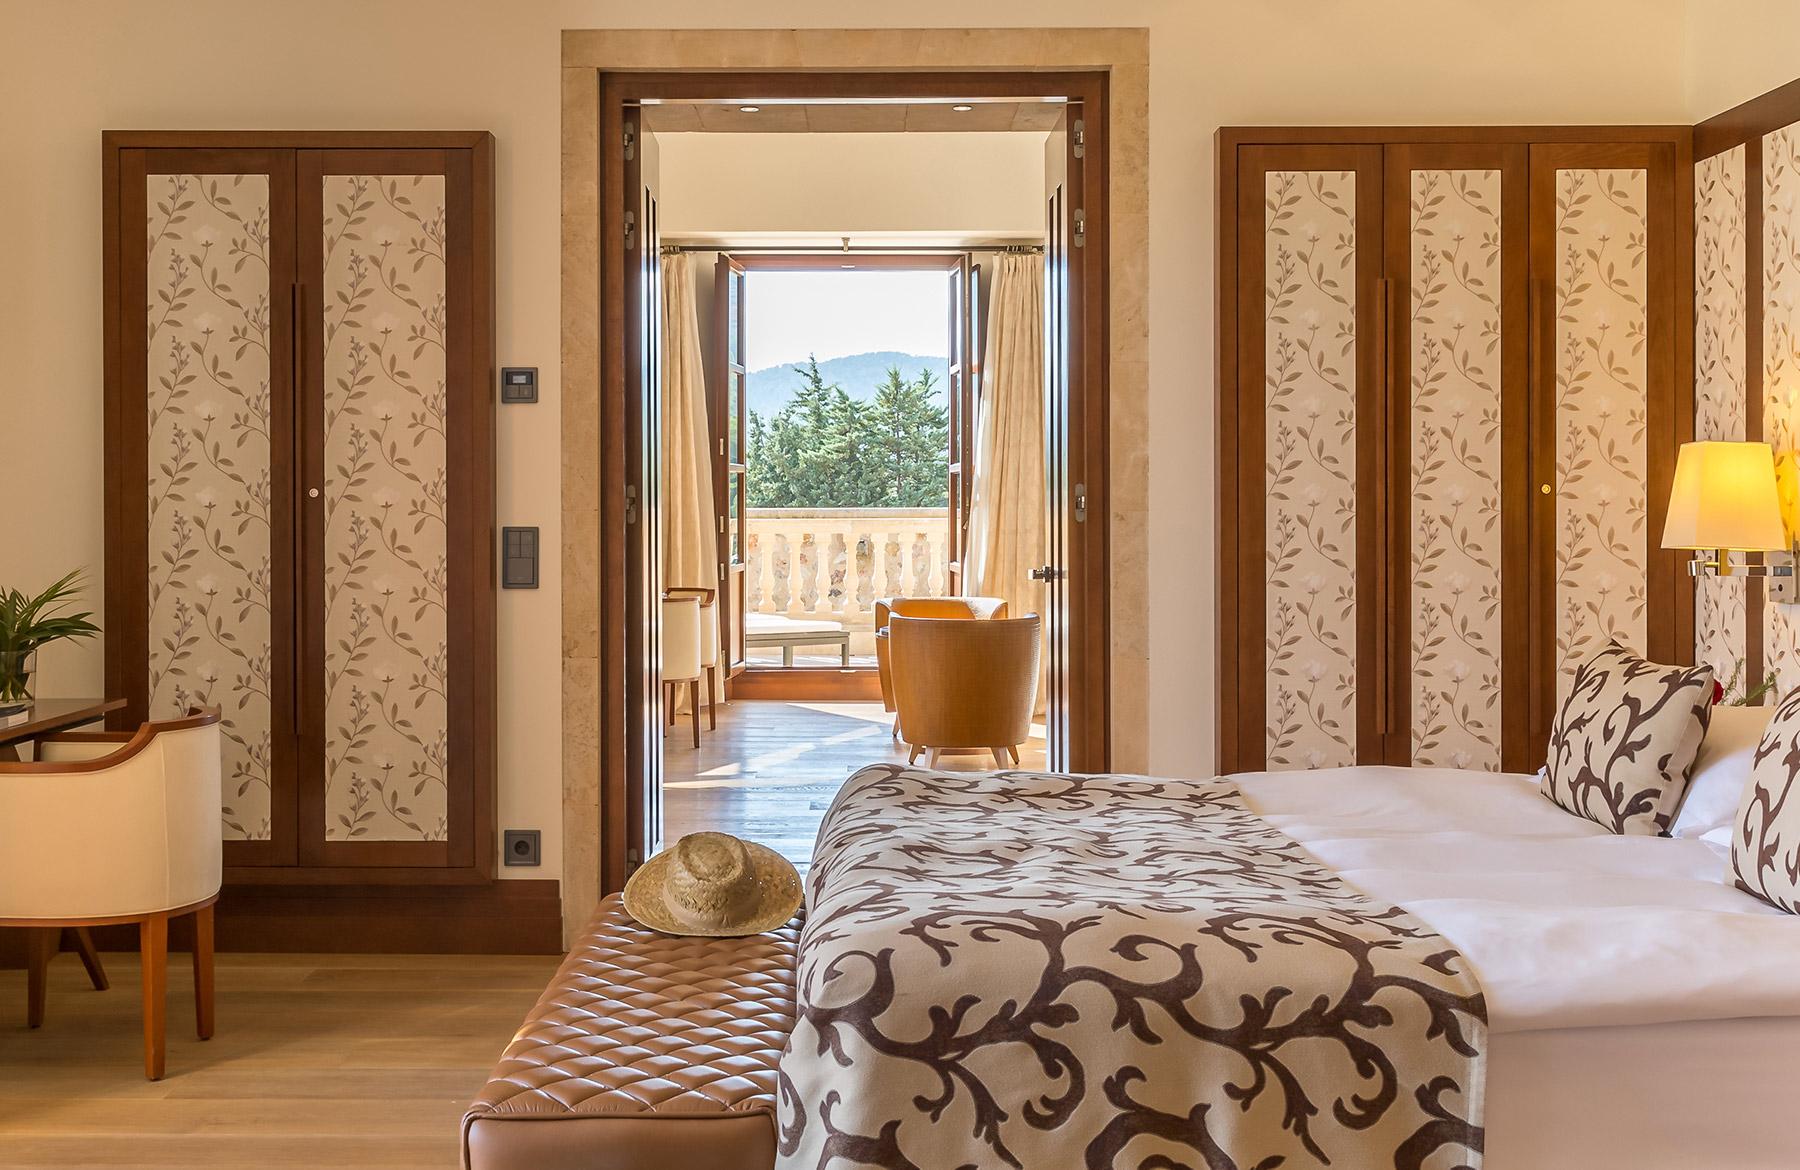 FINESSE, Magazin, Travel, Gourmet, Food, Mallorca, Hotel, Castell Son Claret, Luxusurlaub, Luxusrefugium, Doppelzimmer, Suite